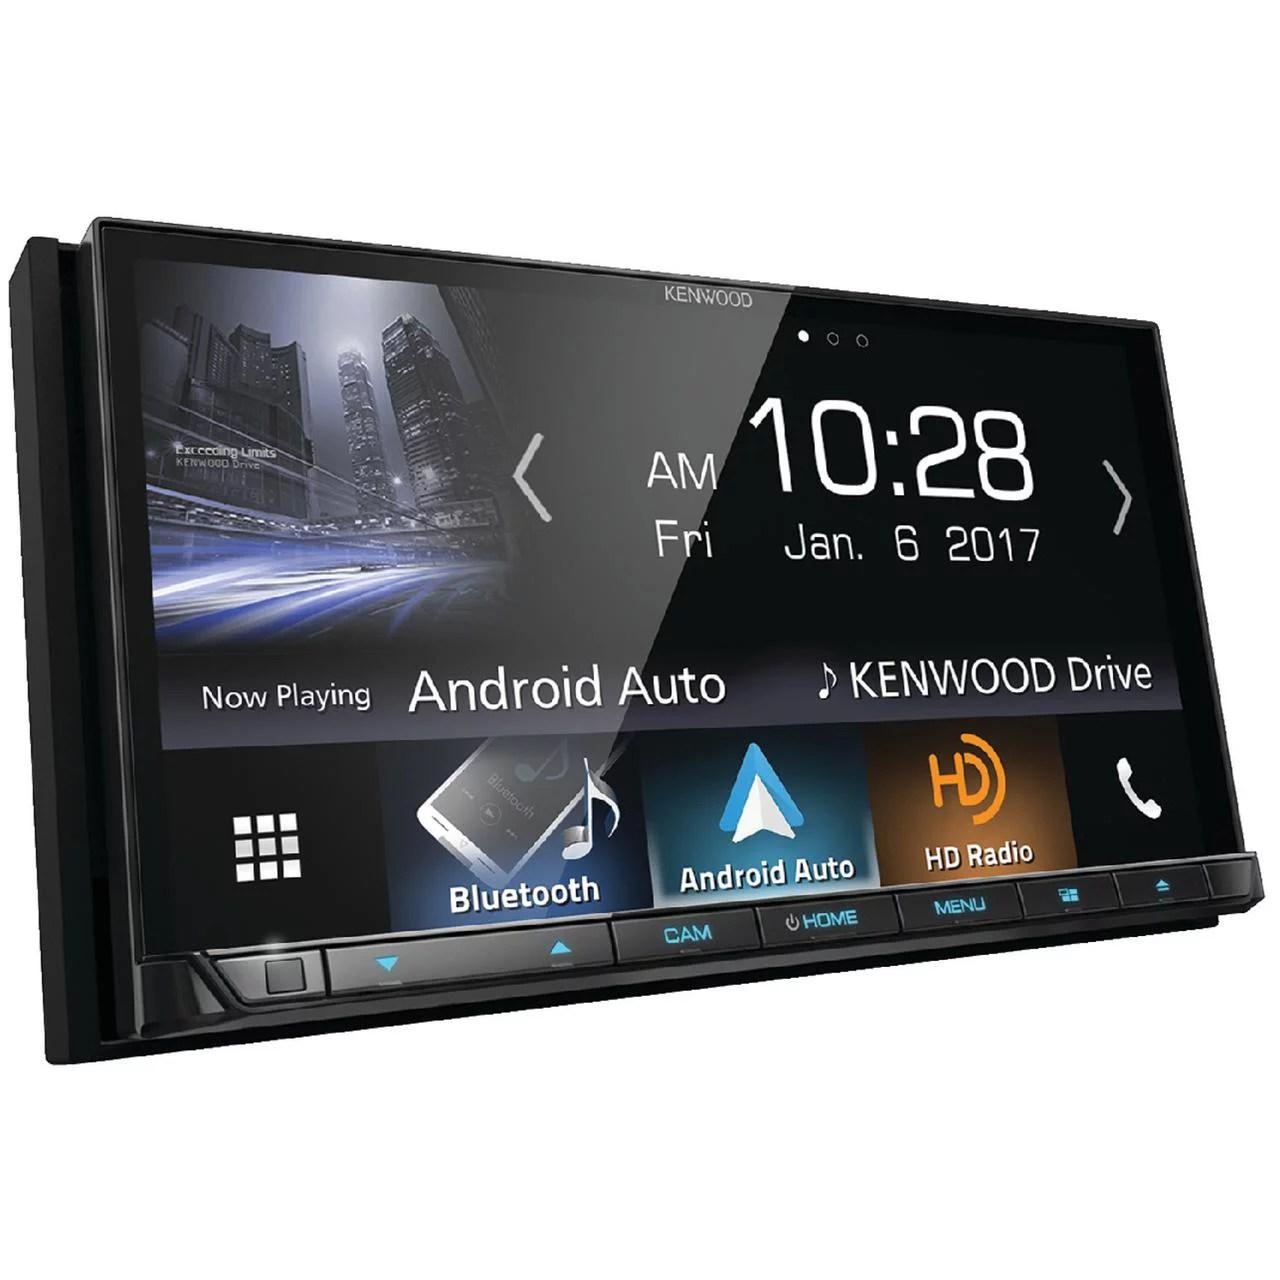 car stereos walmart com 2001 dodge ram 2500 radio wiring ebay electronics review ebooks [ 1280 x 1280 Pixel ]